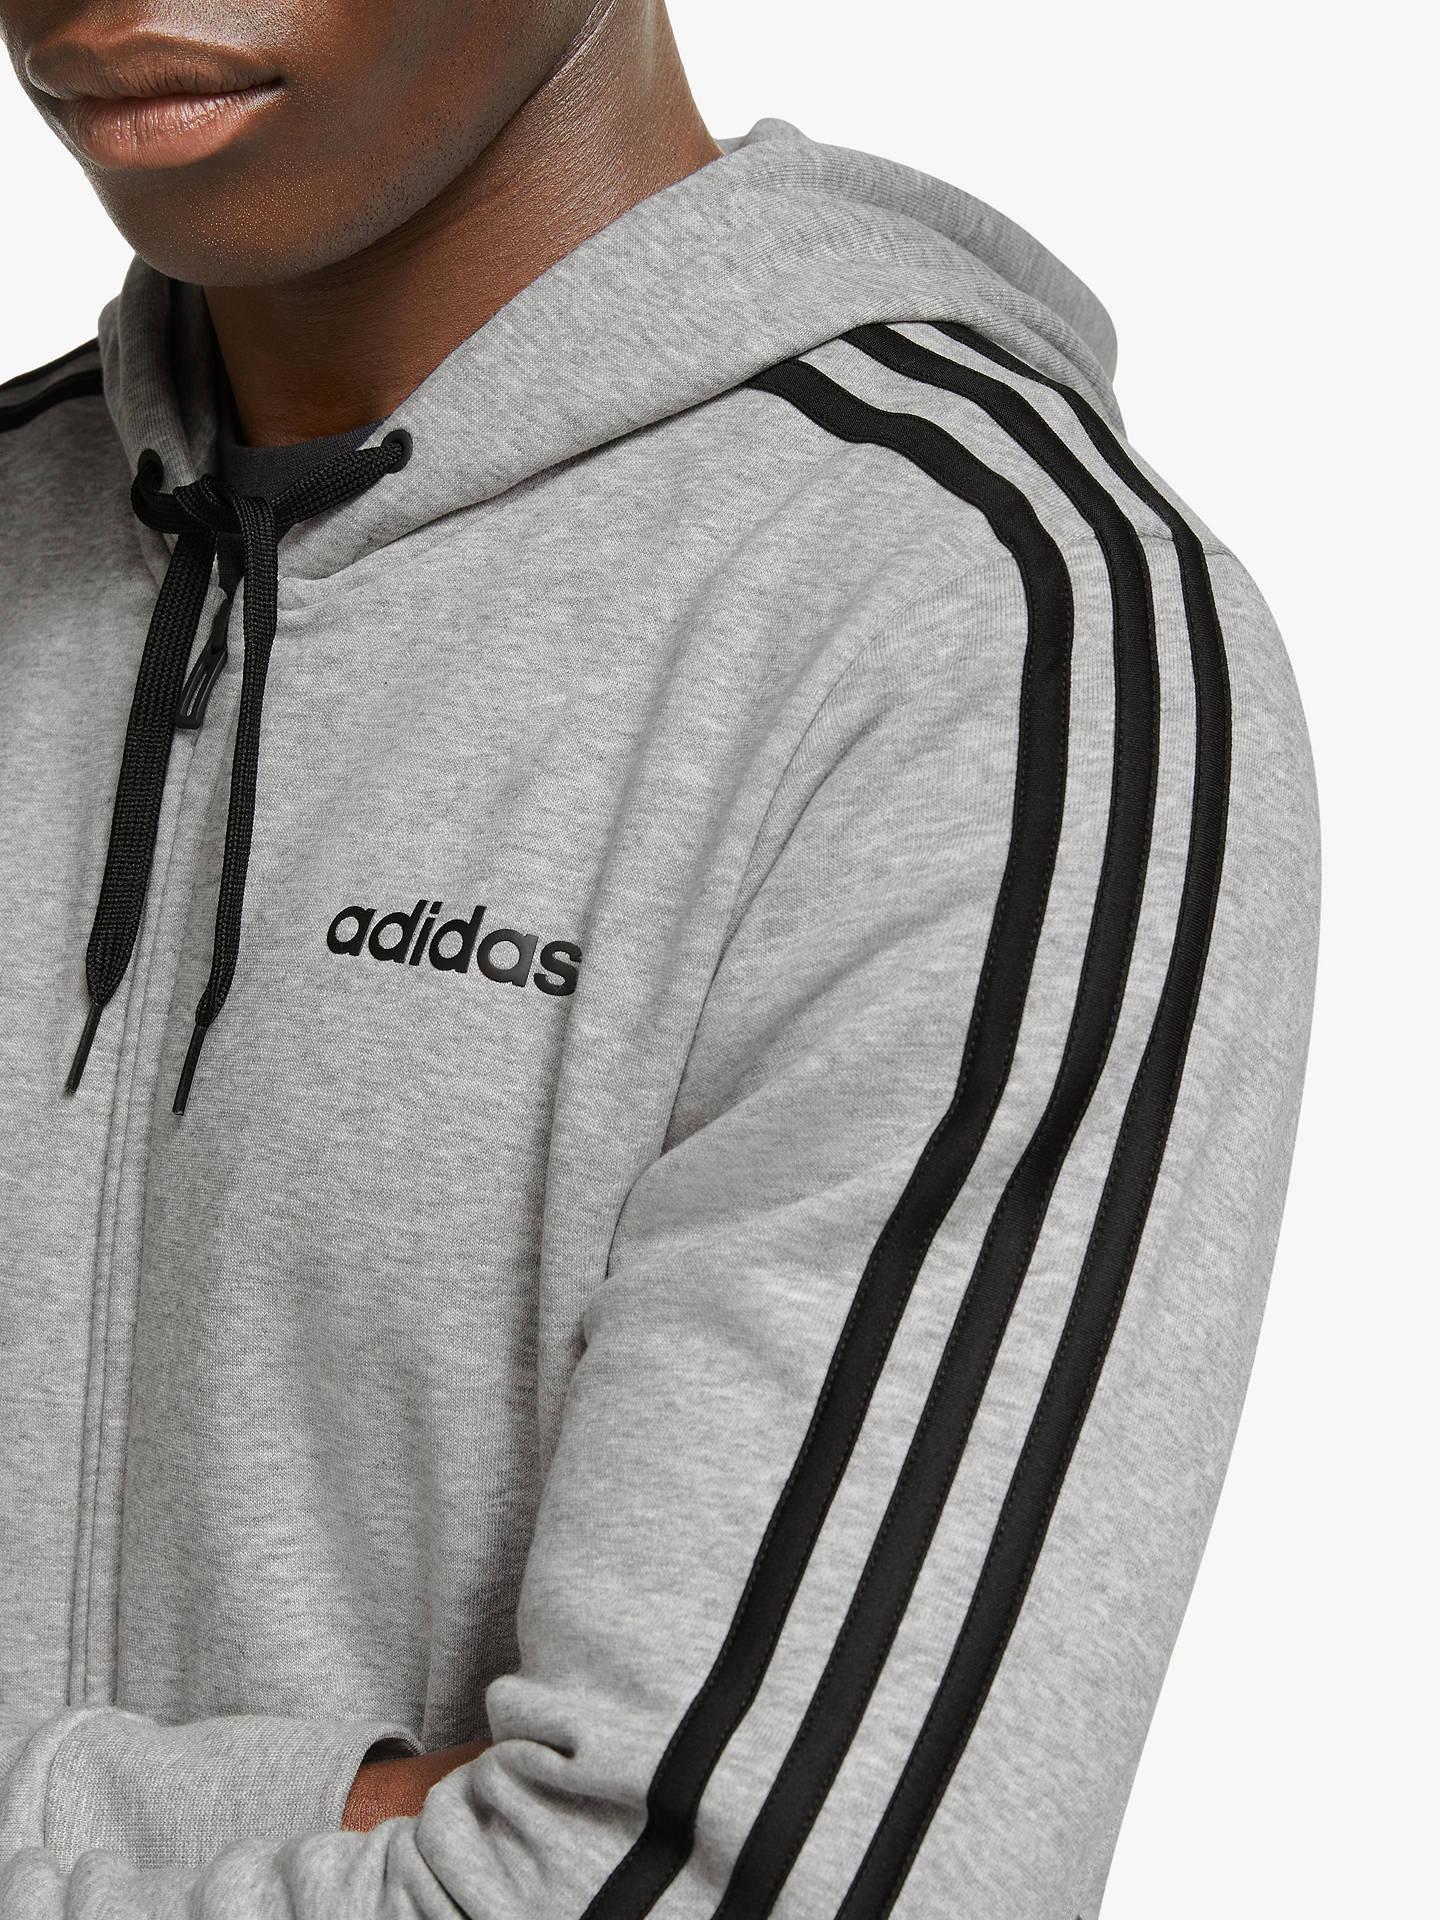 adidas LK Essentials 3 Stripes Full Zip Hoody adidas